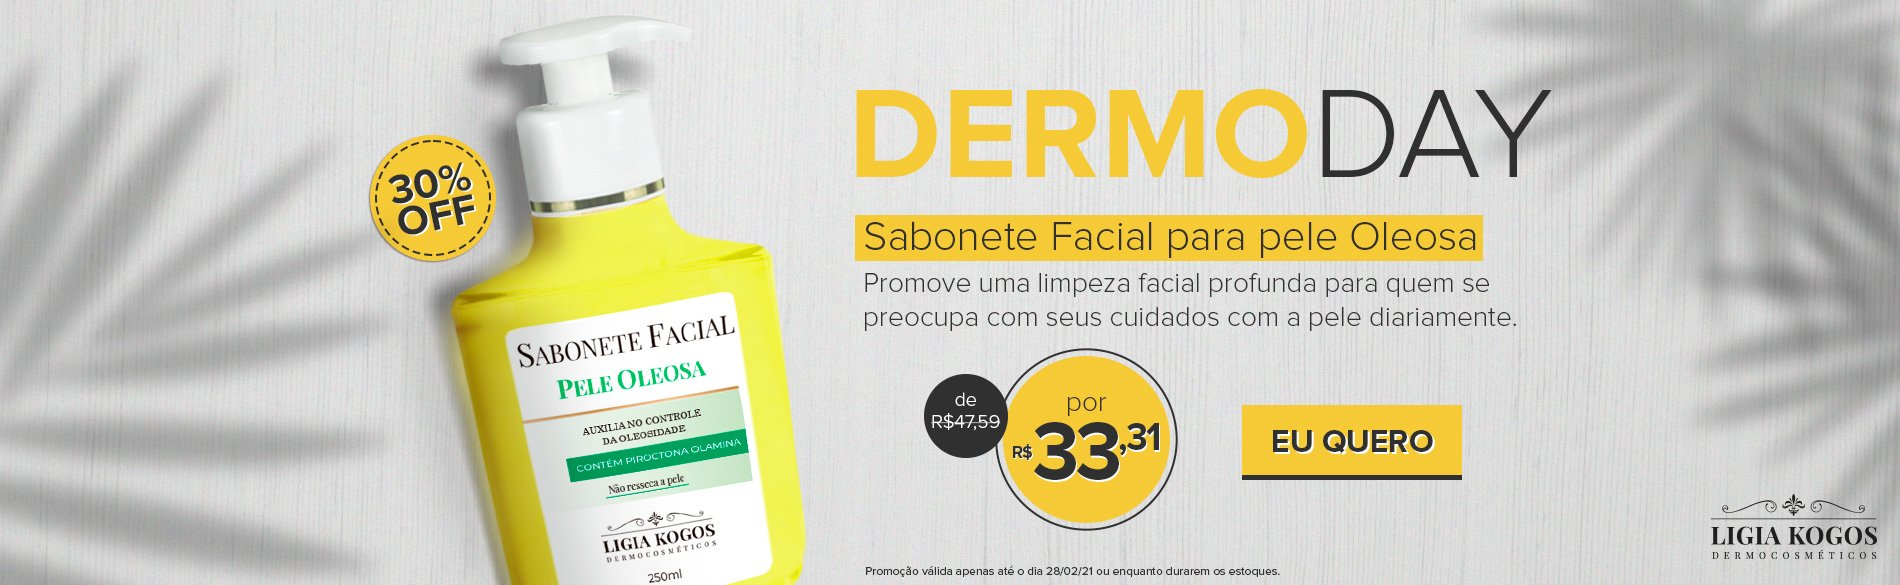 Dermo Day - Sabonete pele Oleosa